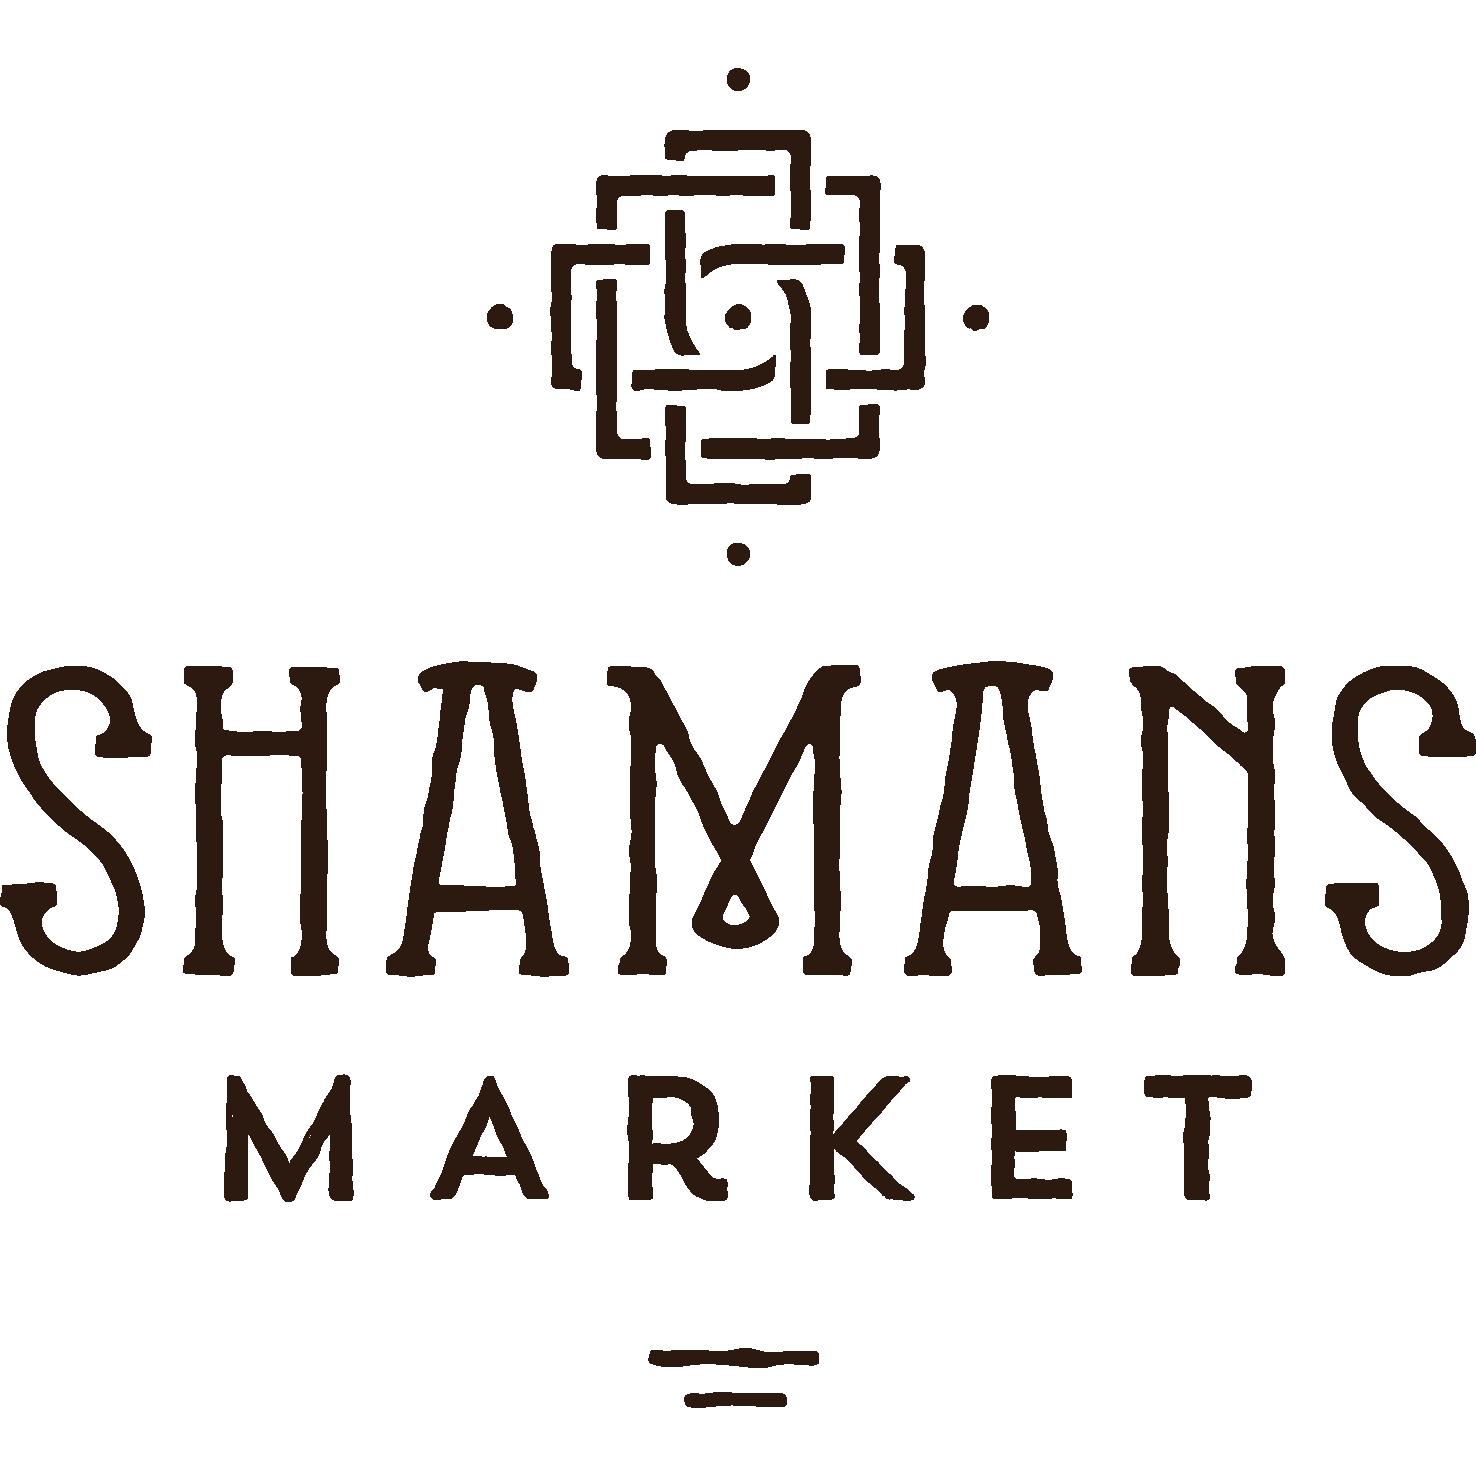 Shamans Market | Palo Santo, White Sage & Ritual Tools for Shamanism